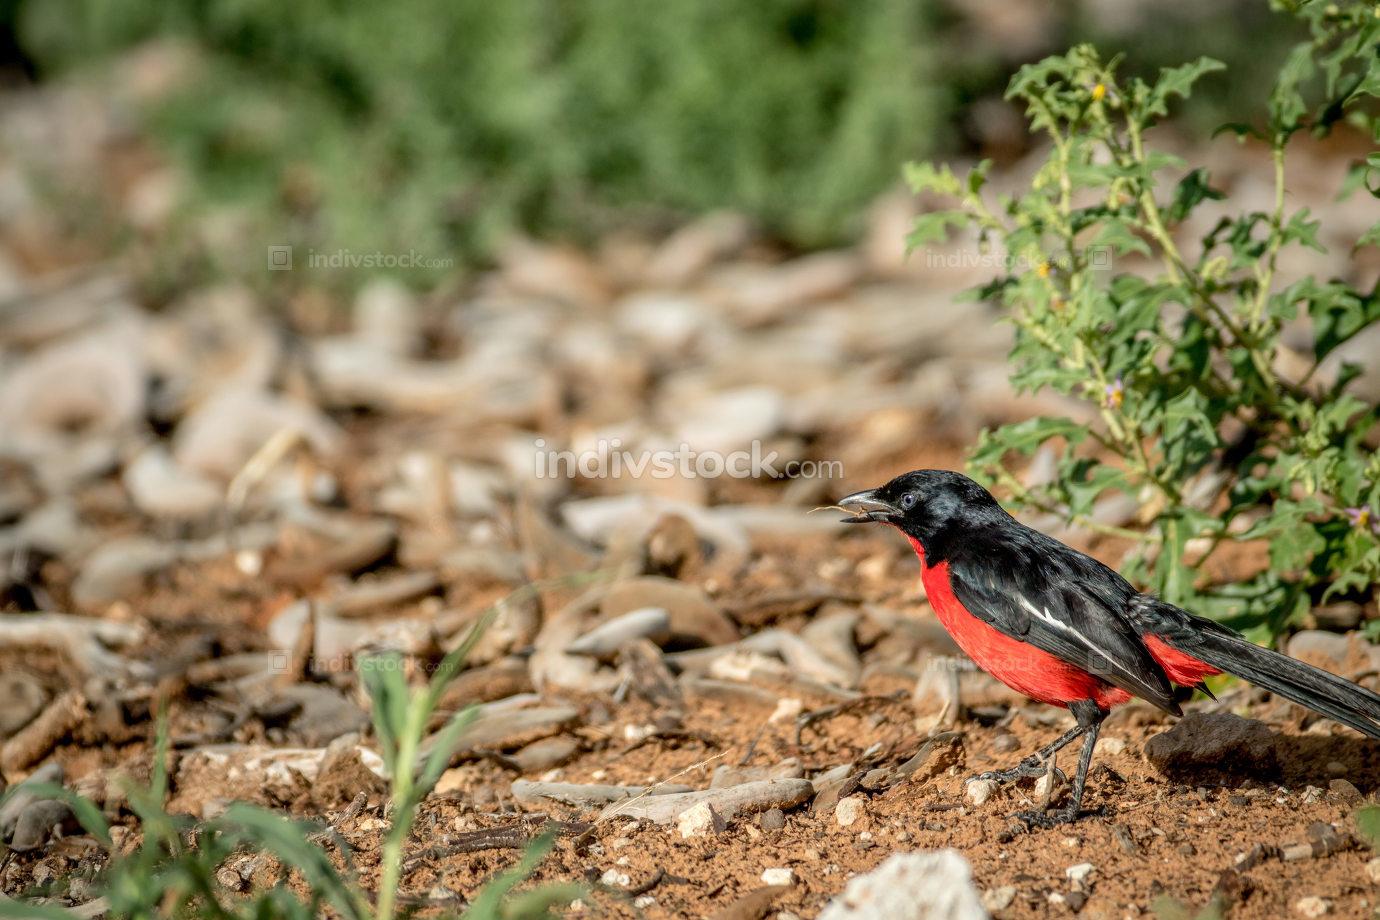 Crimson-breasted shrike on the ground.